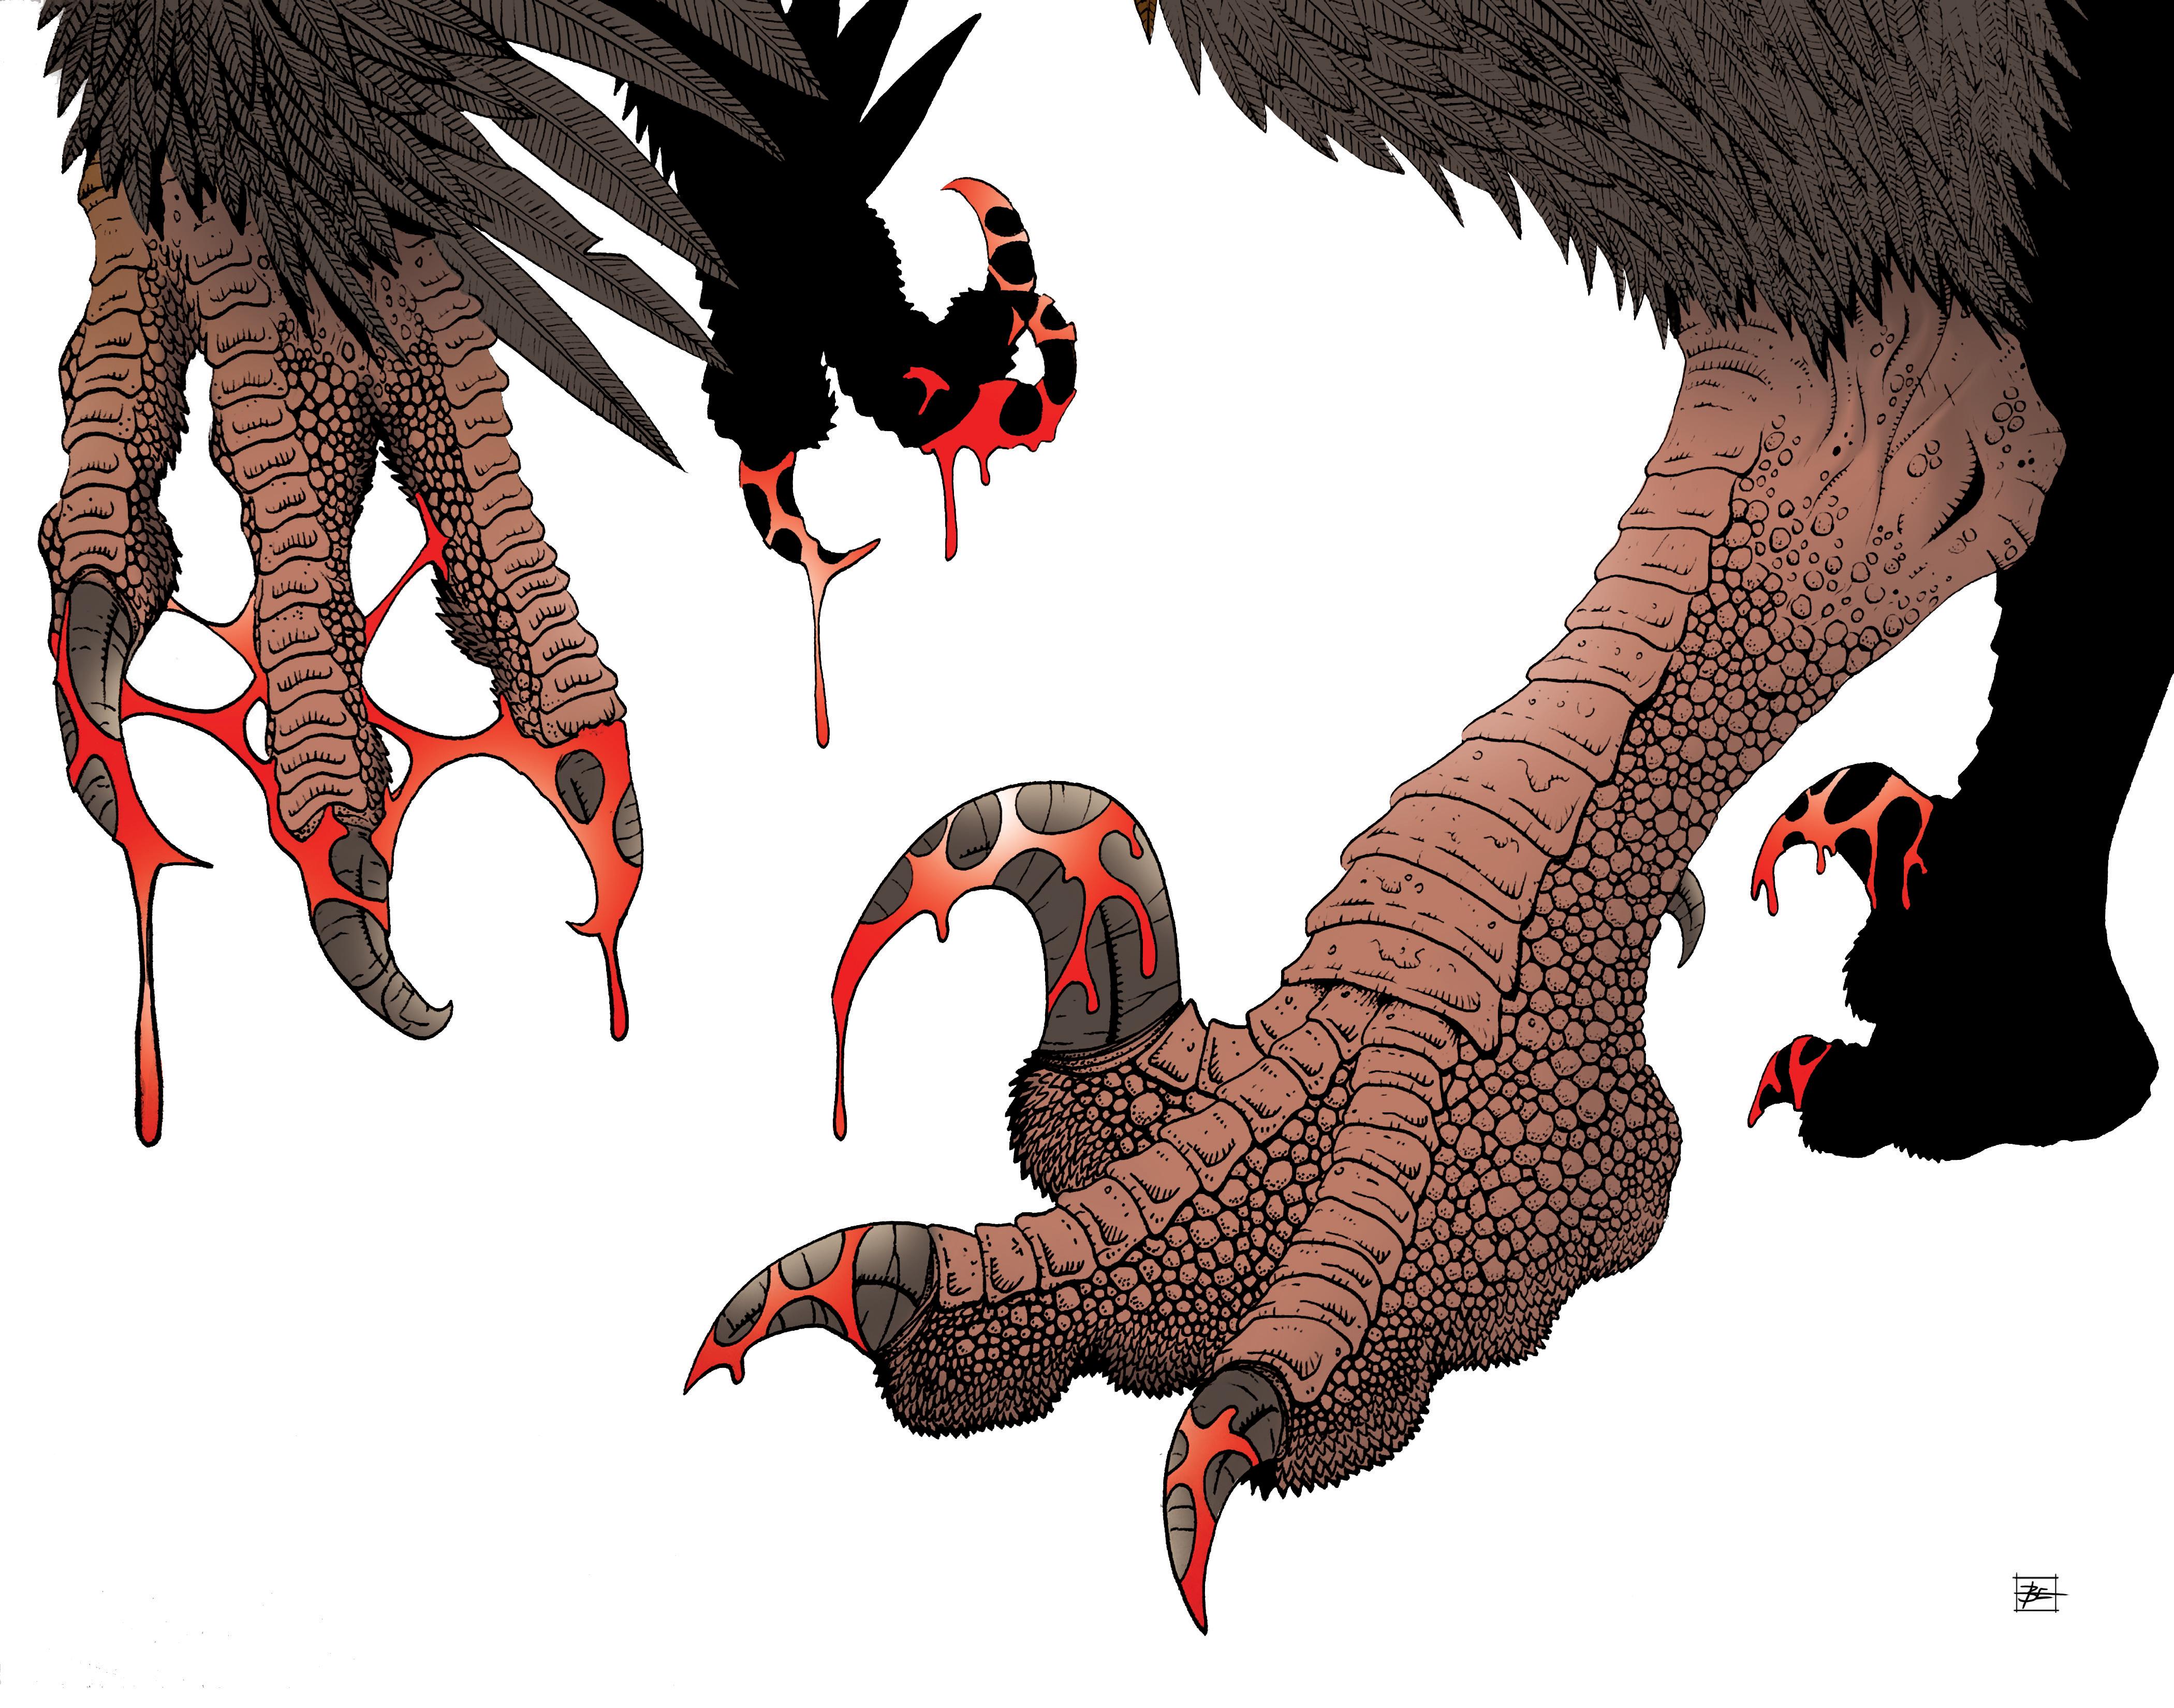 Velociraptor Claws